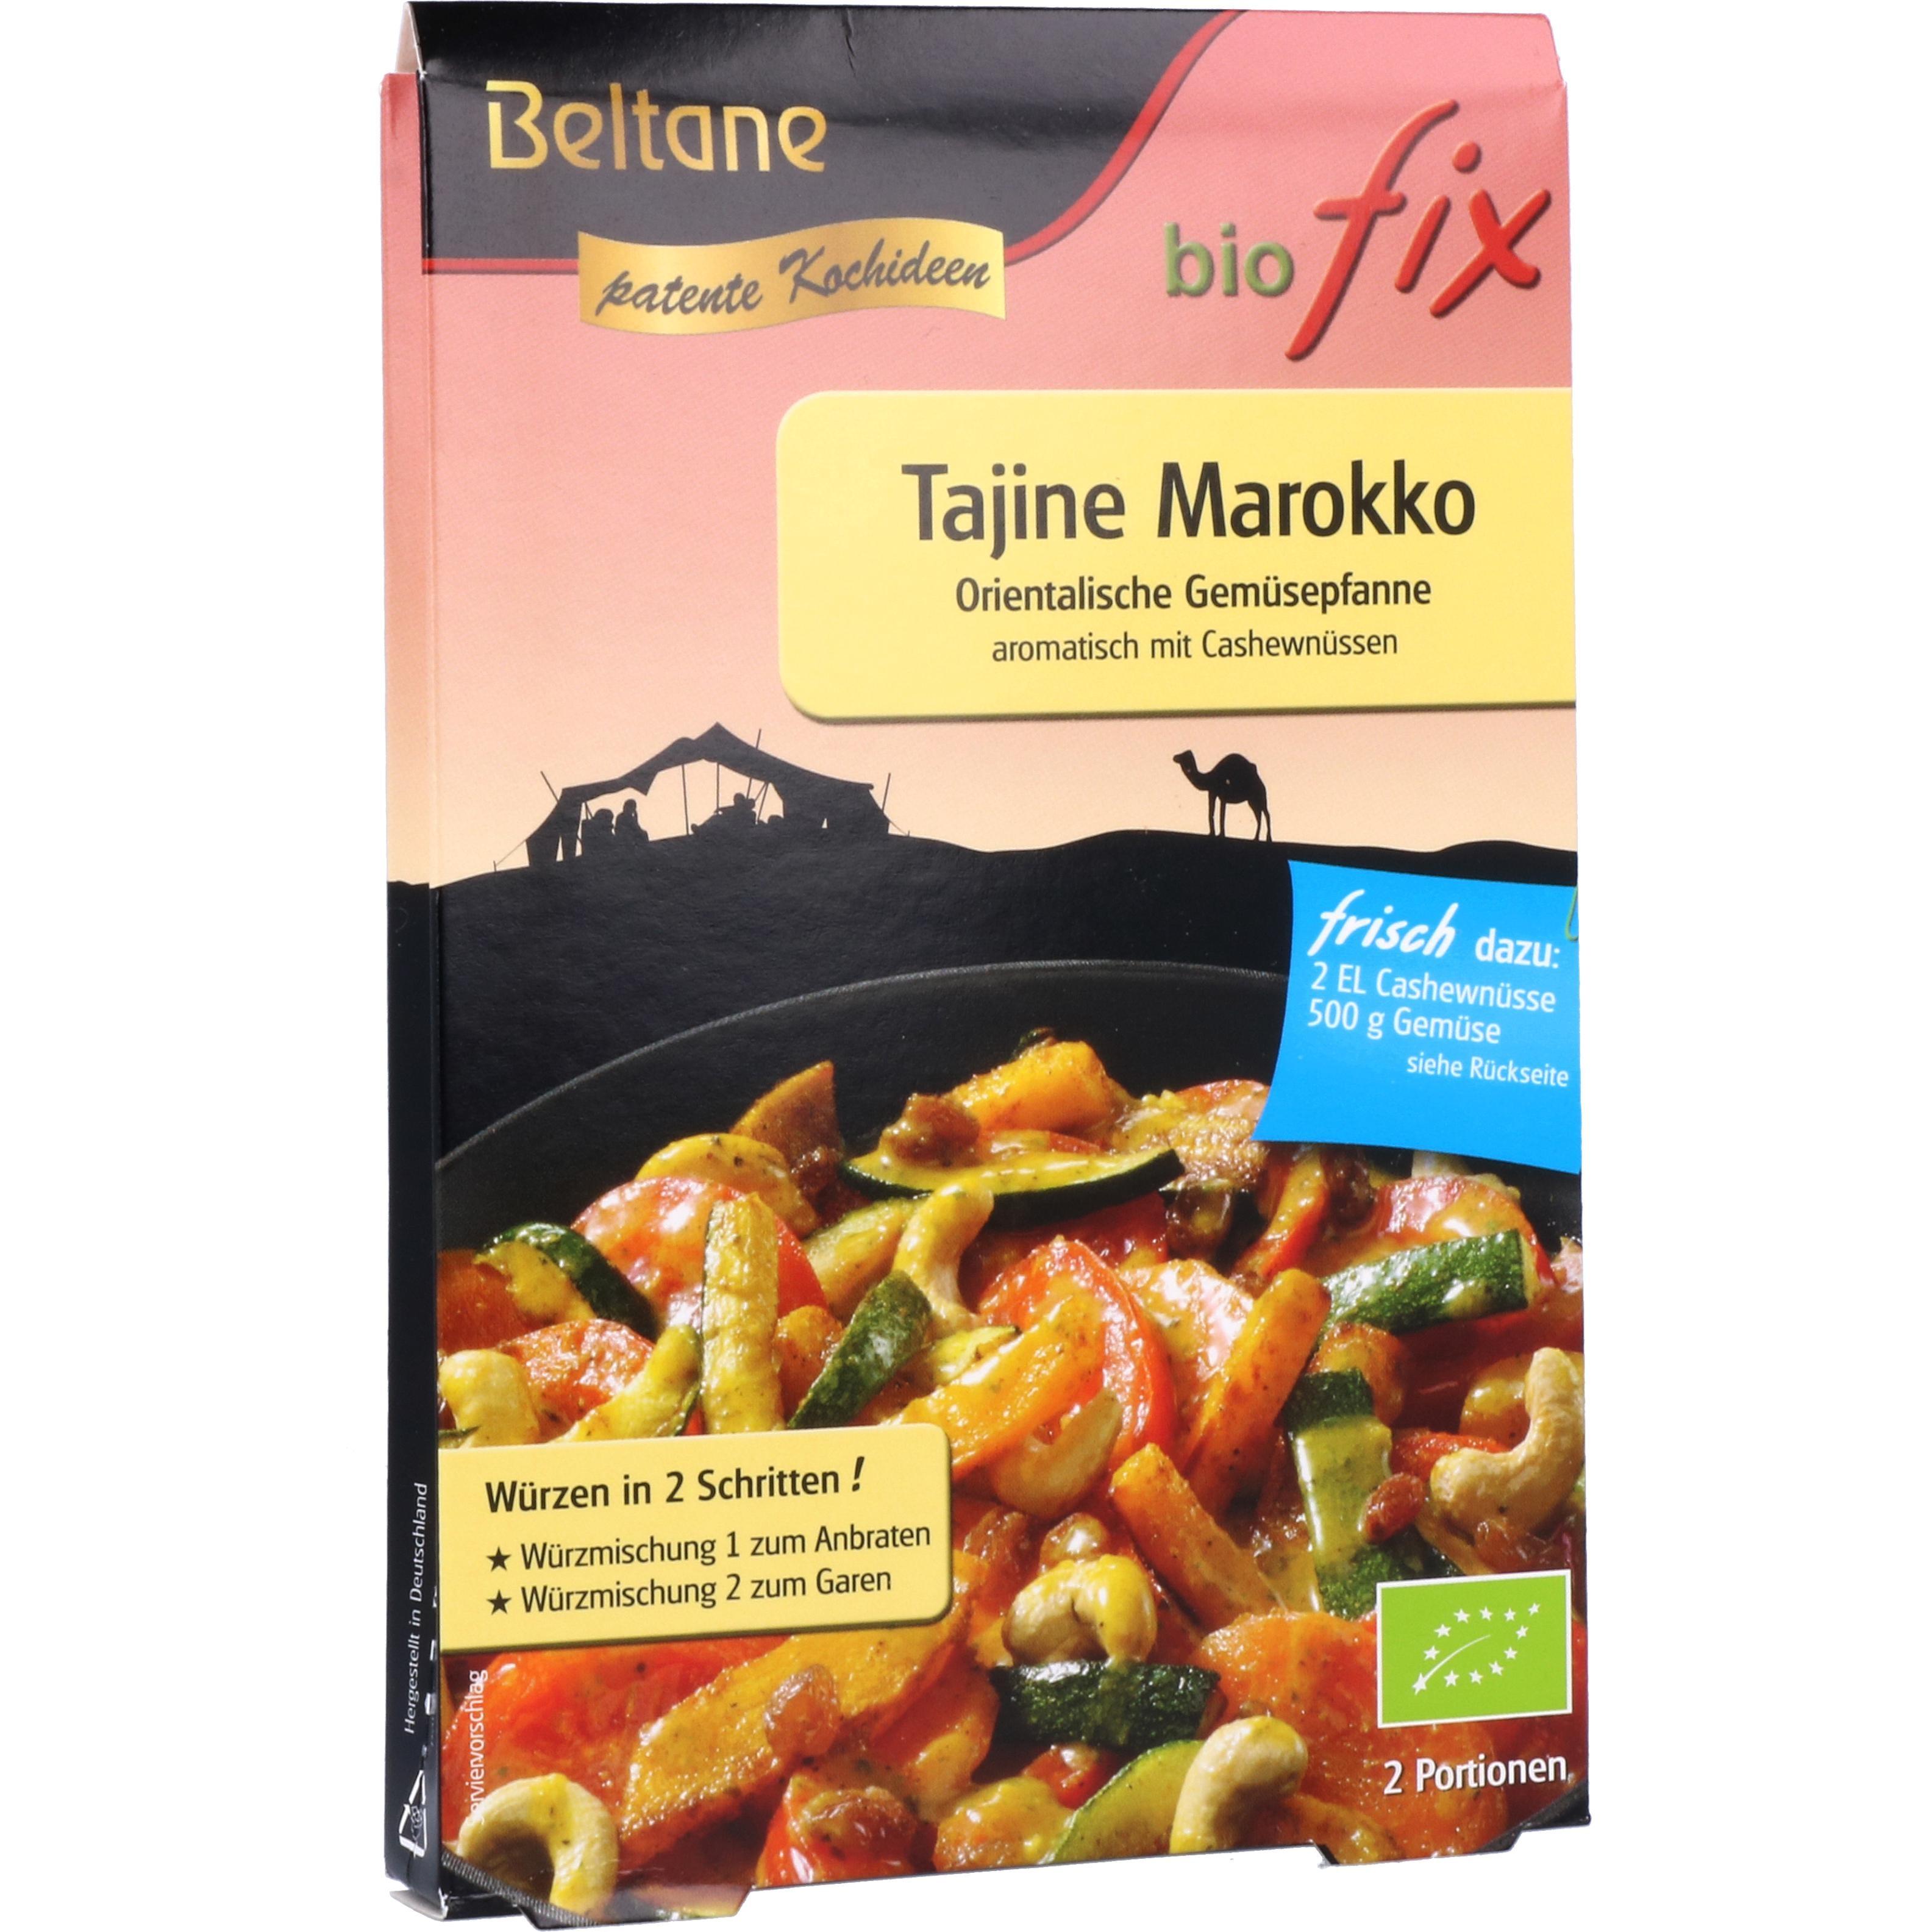 Beltane Bio Fix Tajine Marokko 24g